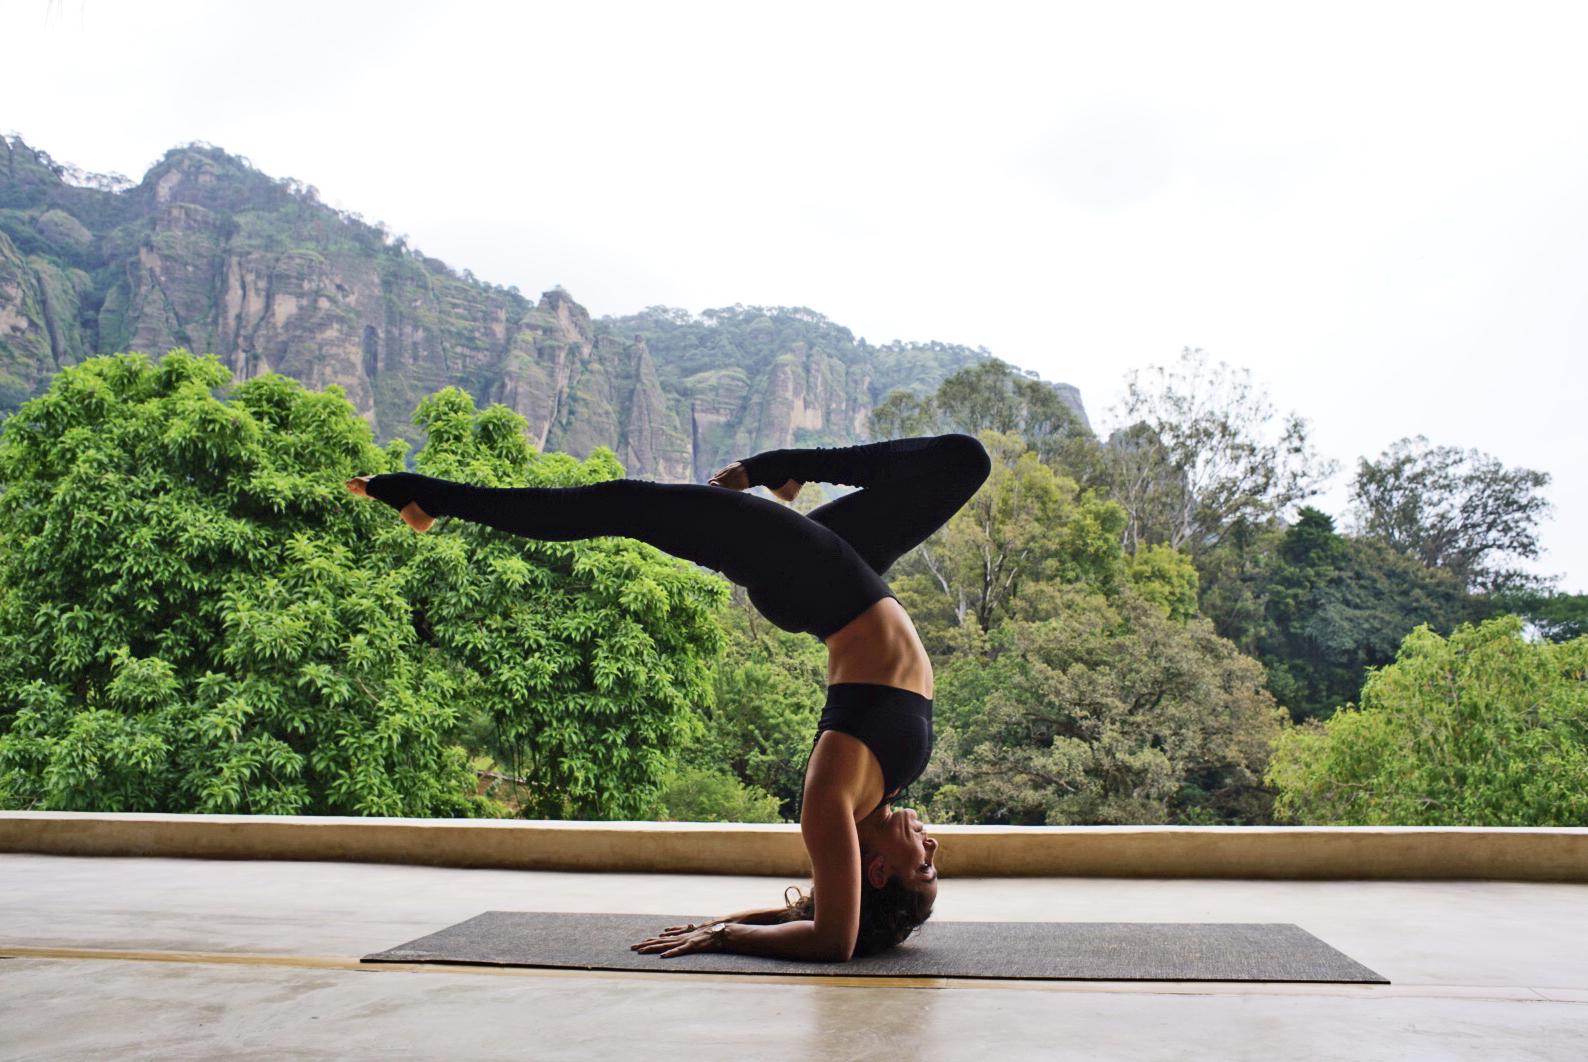 Spa Matilda Hosting Life Balance Yoga Retreat With Yoga Master Laila Kuri Inmexico